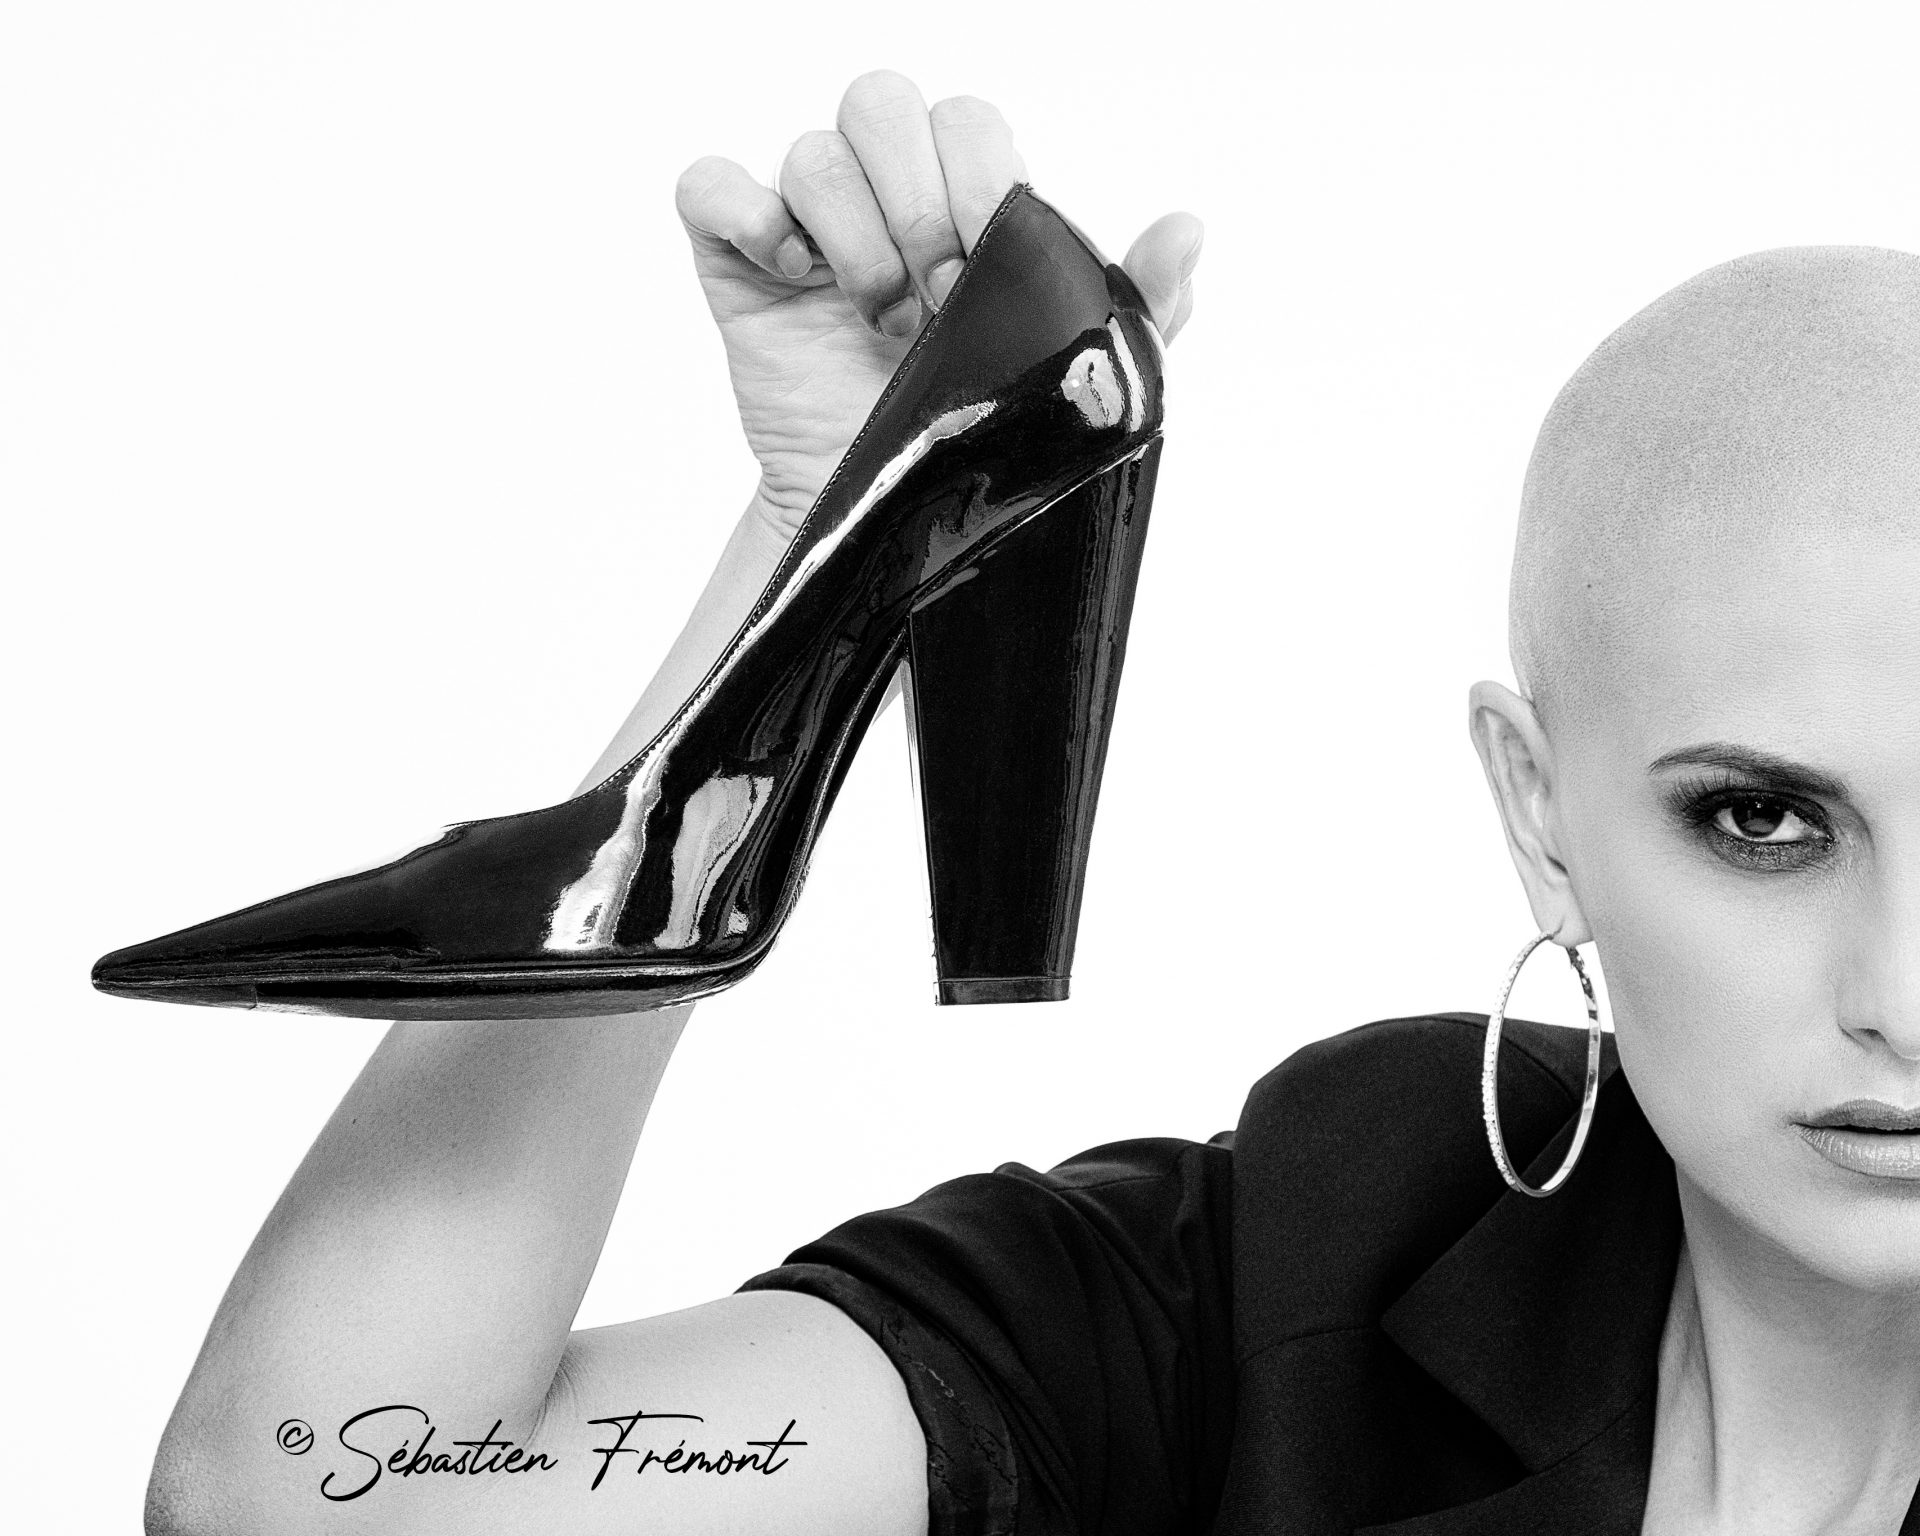 French Photographer Portrait Photography Abigail Lopez-Cruz / Givenchy